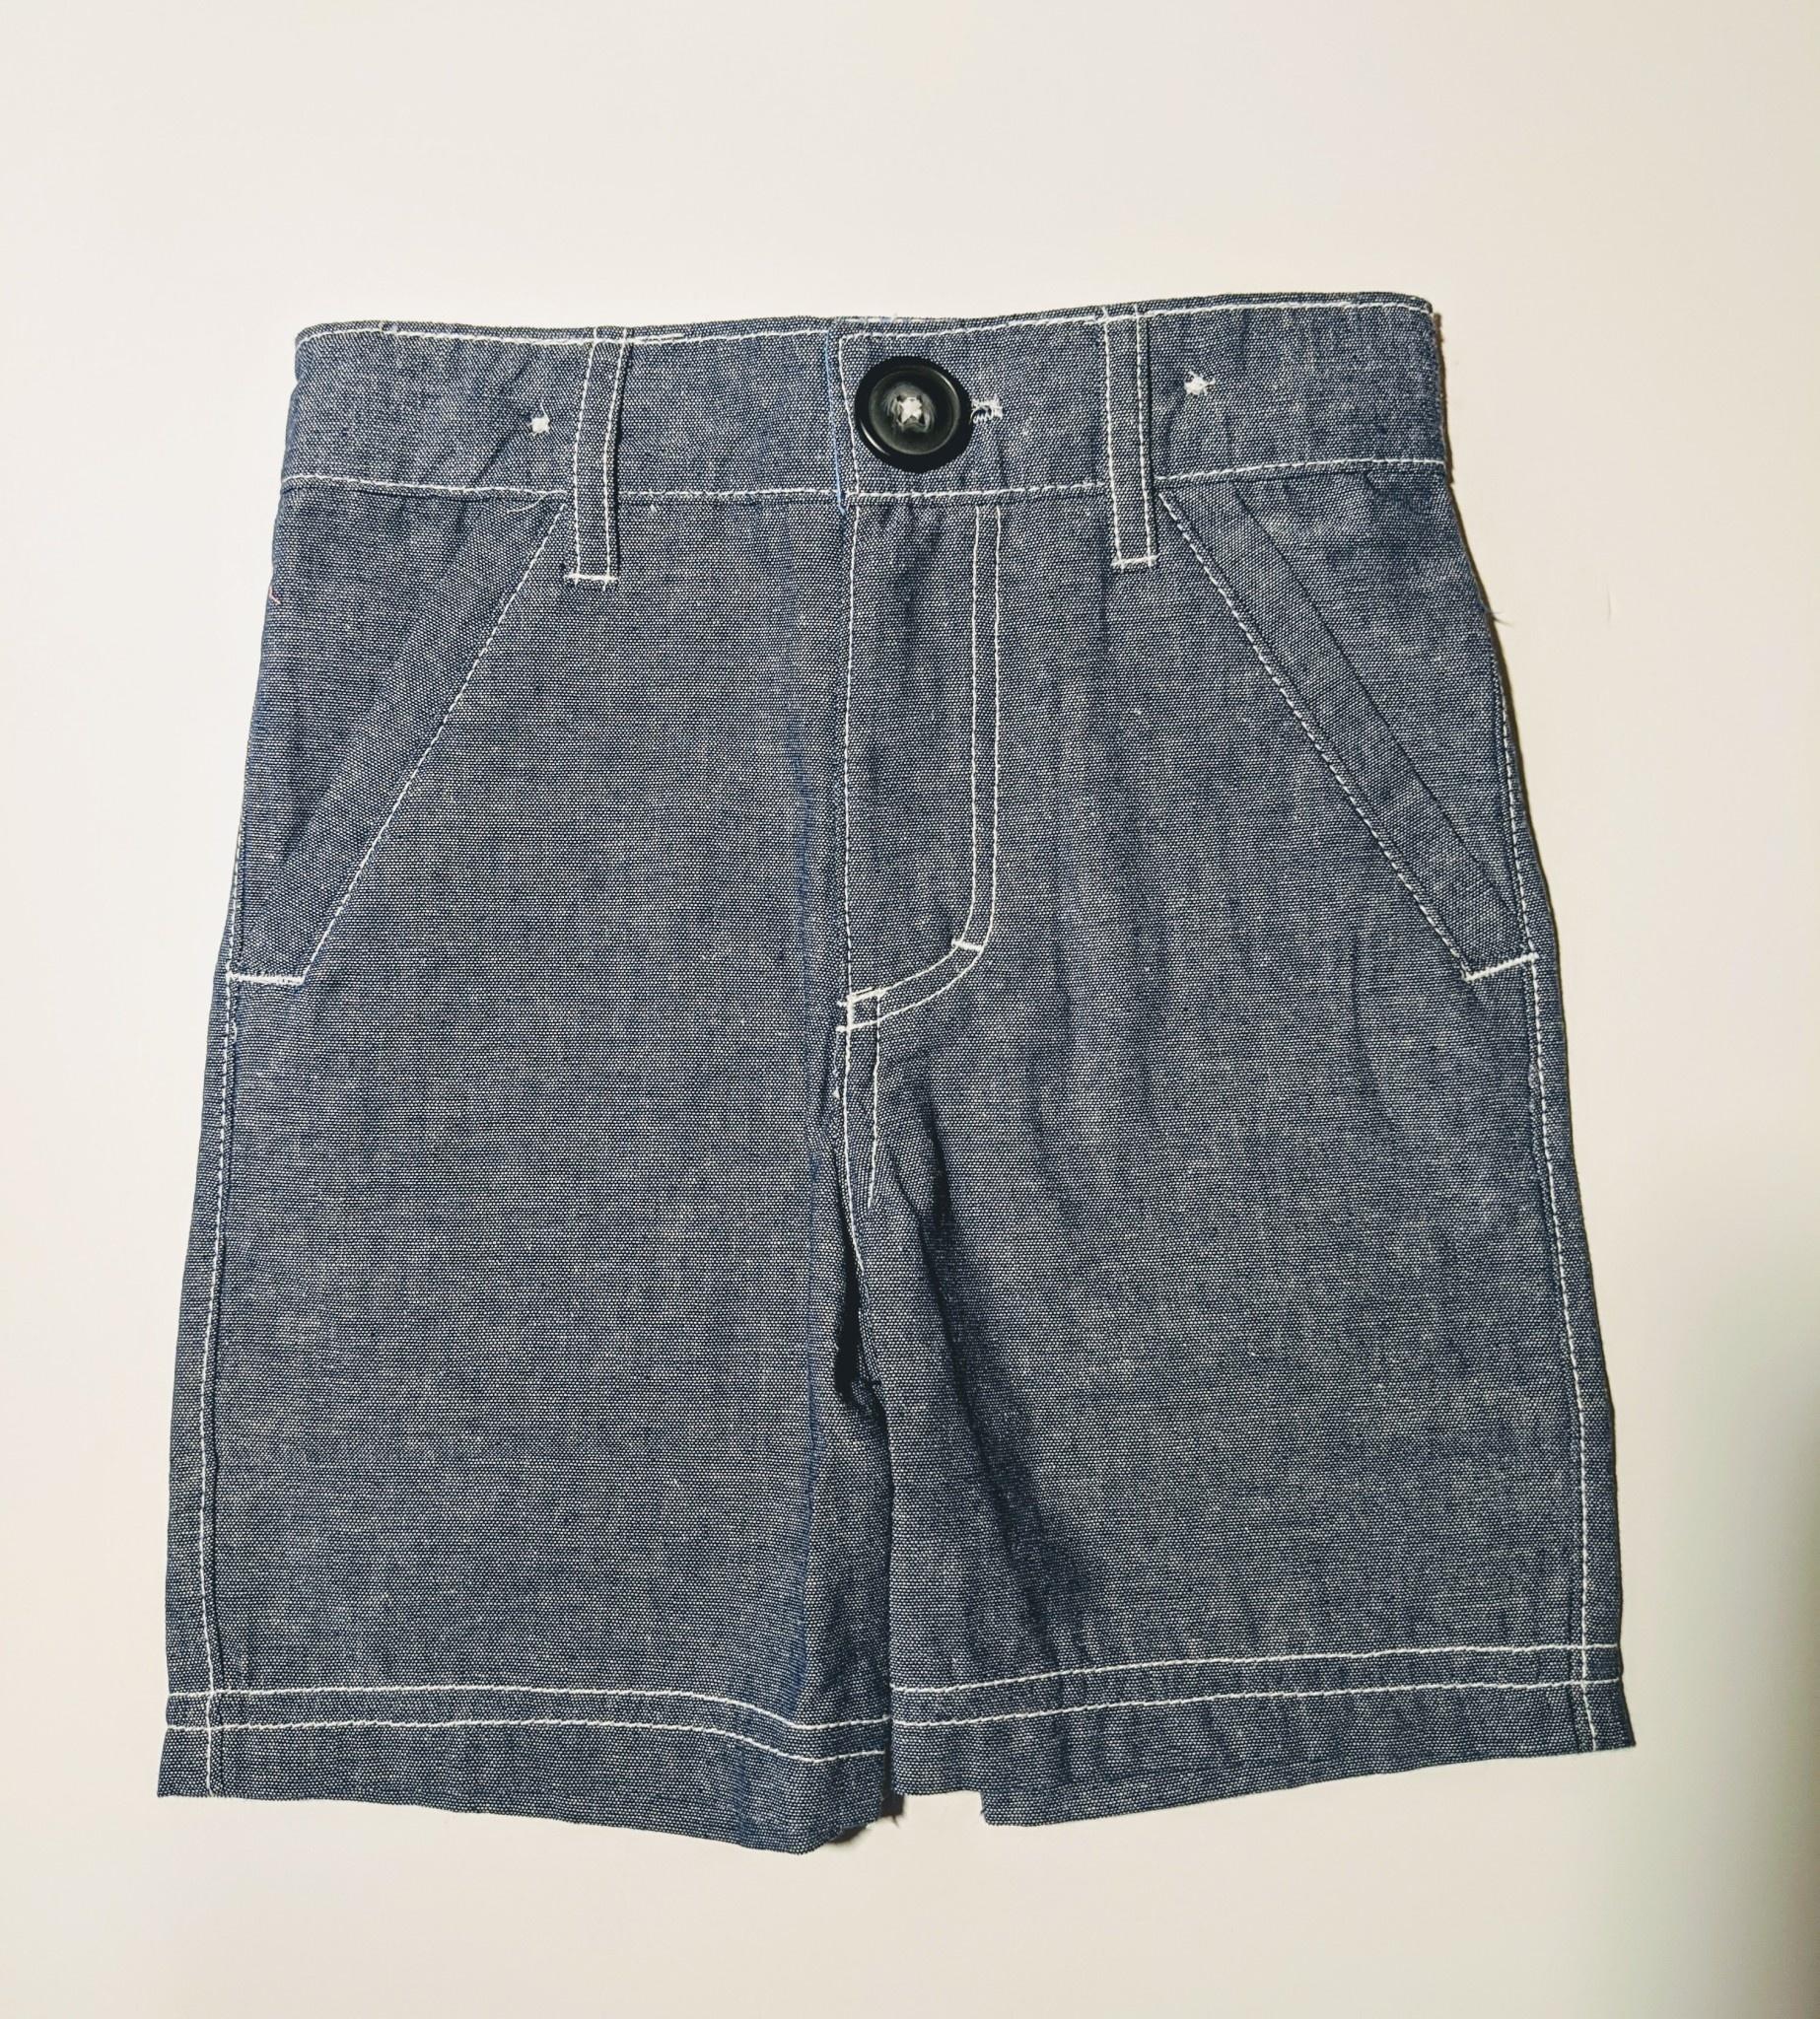 Kapital K Boy's Chambray Shorts